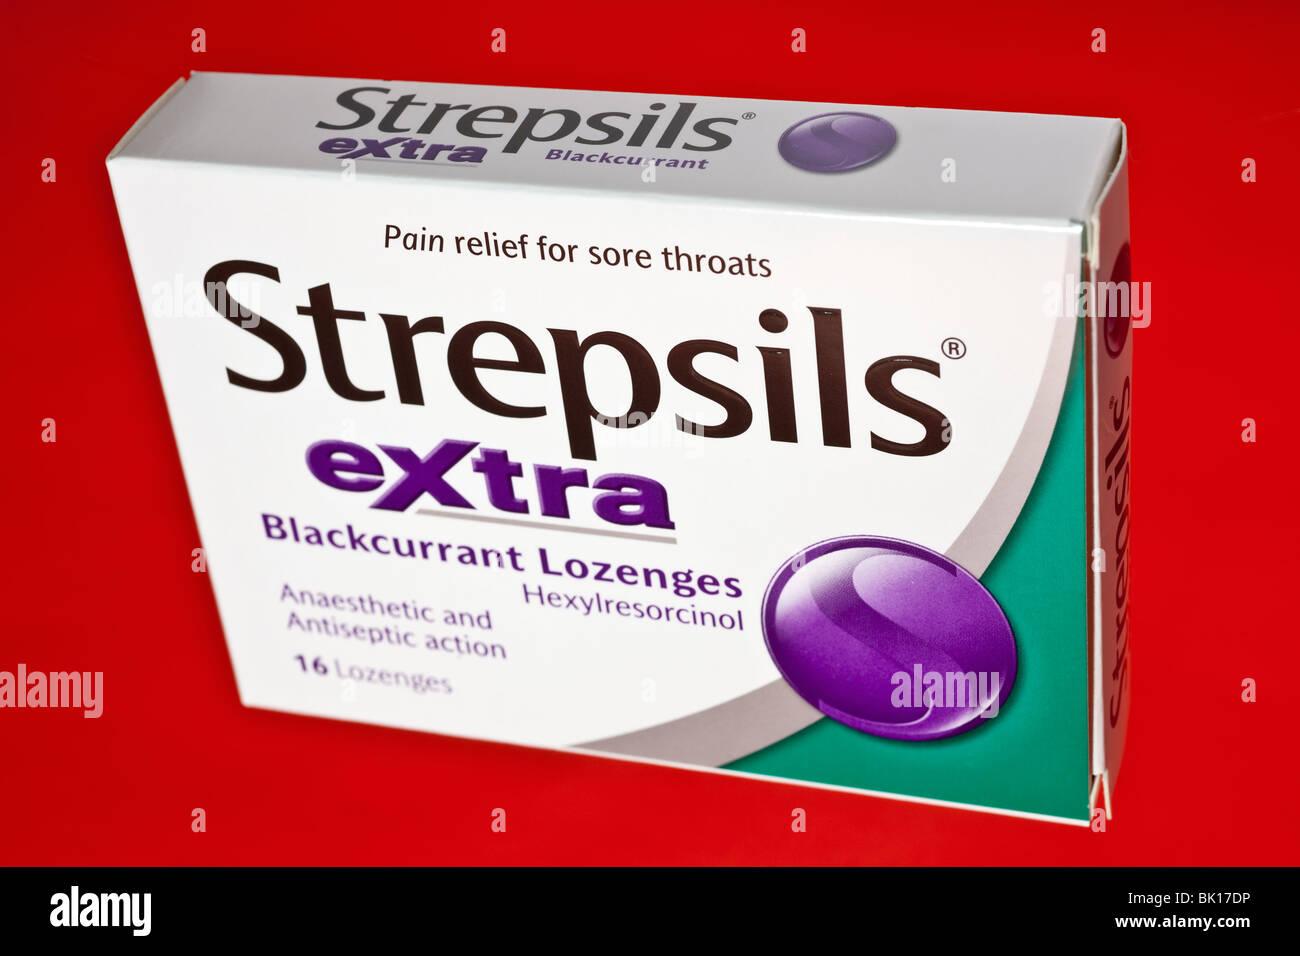 Box of 16 Strepsils Extra blackcurrant lozenges for sore throats - Stock Image